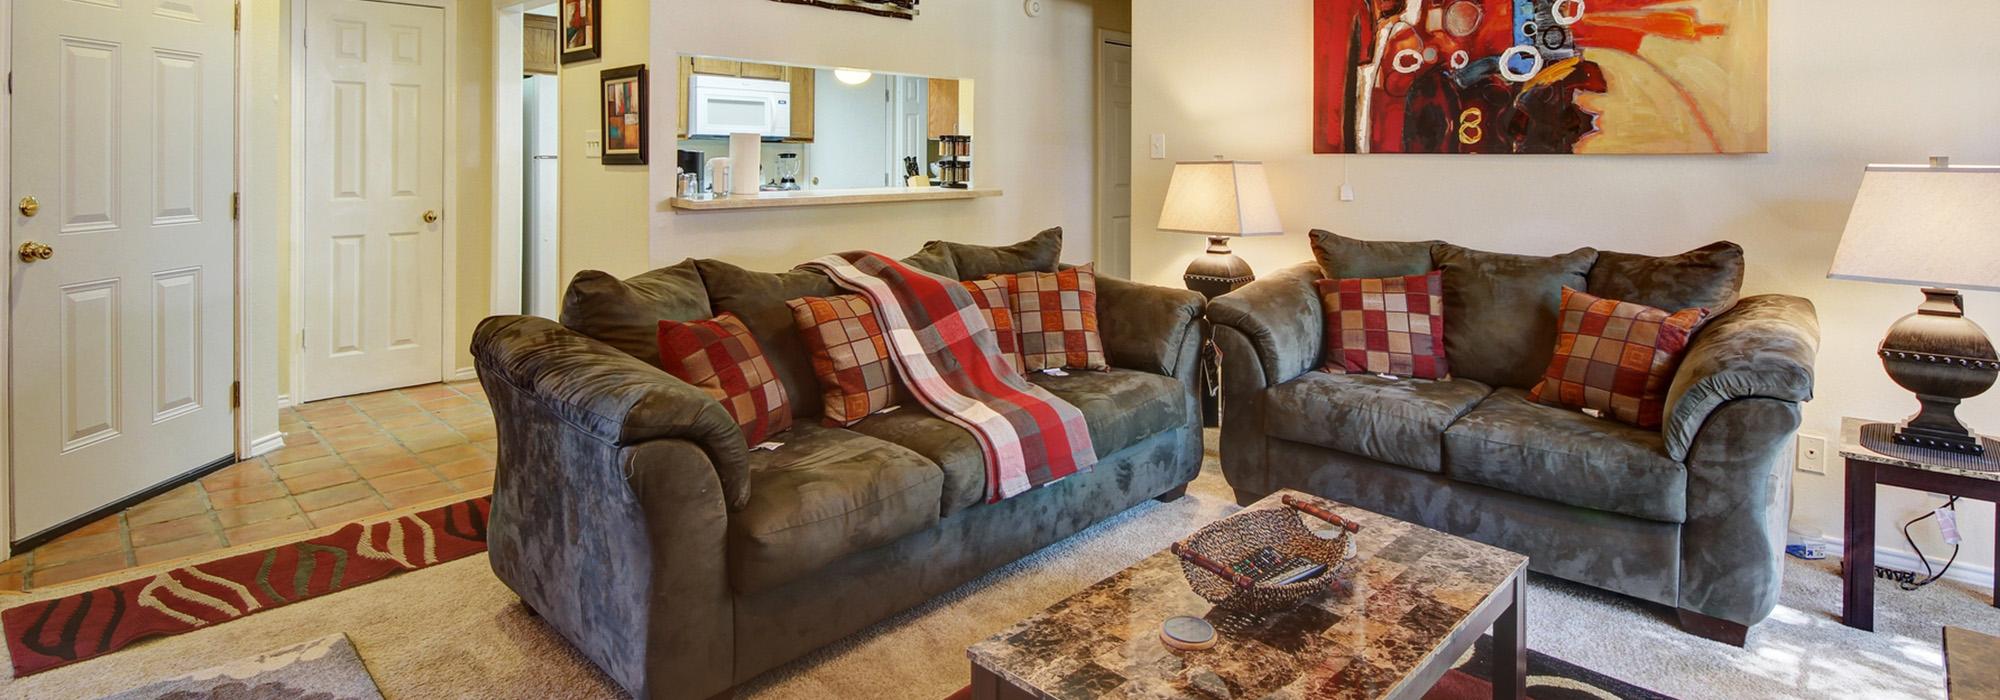 Sir winston corporate housing san antonio furnished apts - One bedroom apartments san antonio ...